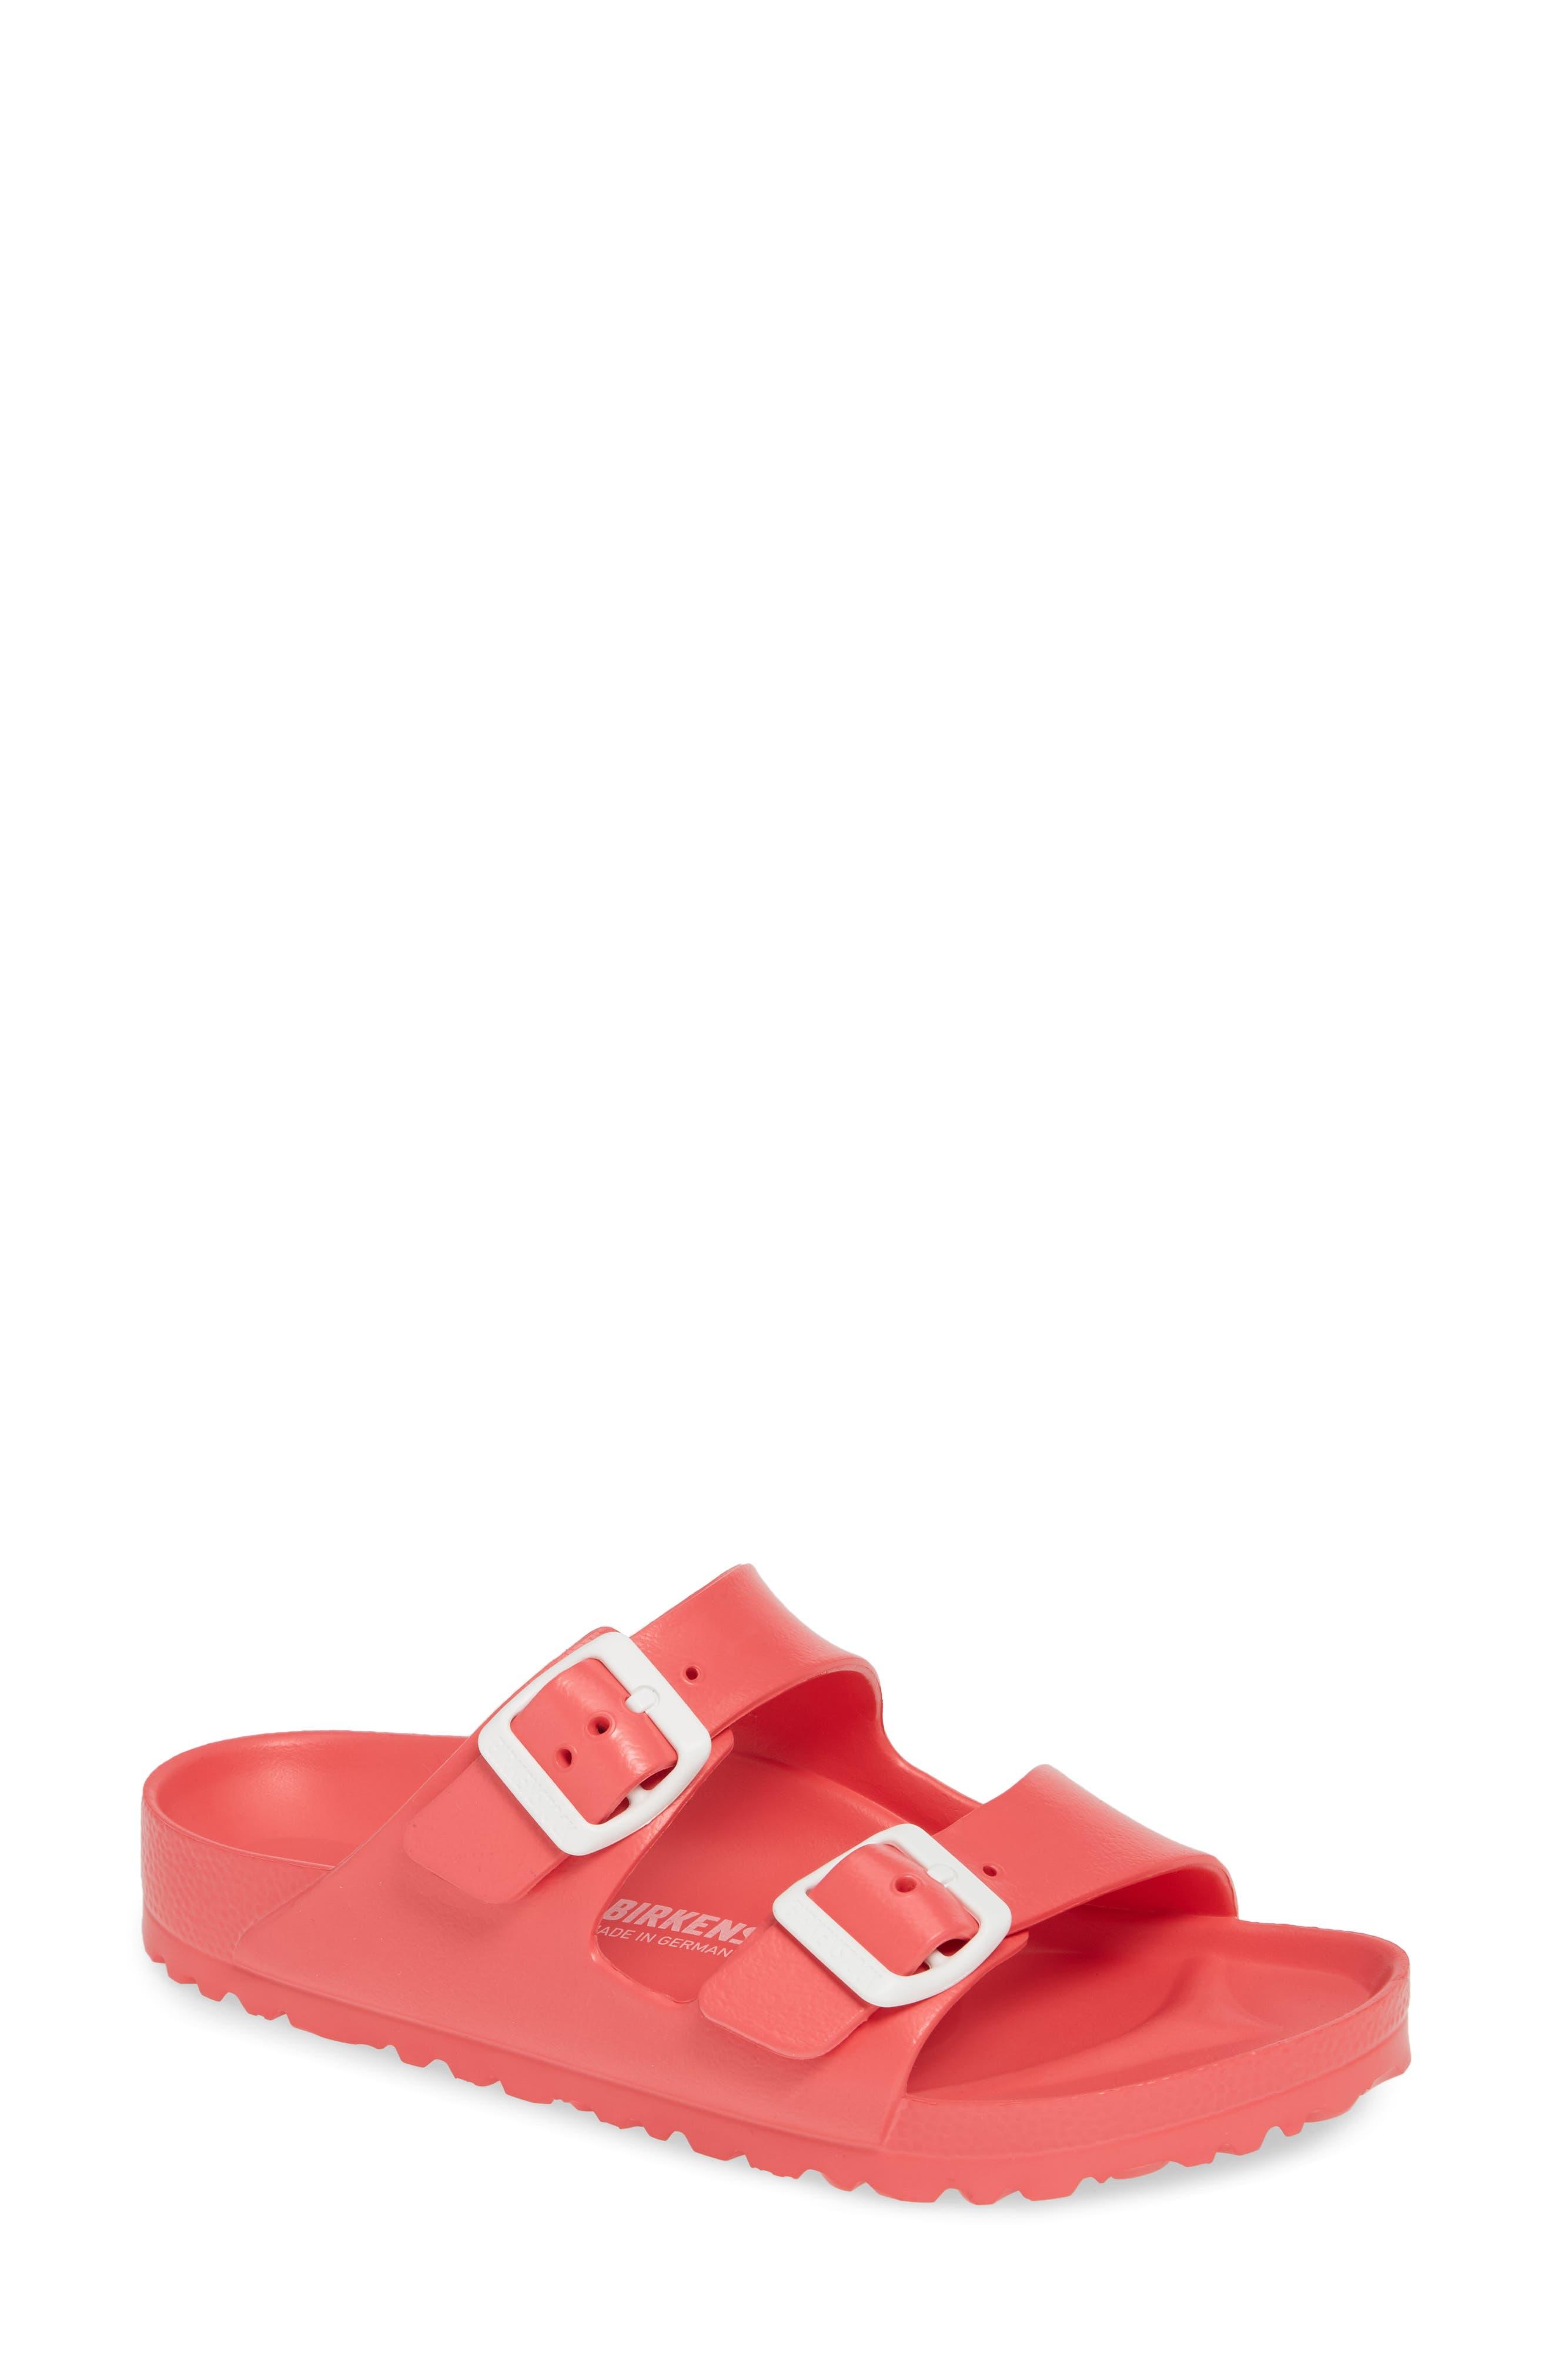 BIRKENSTOCK Essentials - Arizona Slide Sandal, Main, color, CORAL EVA